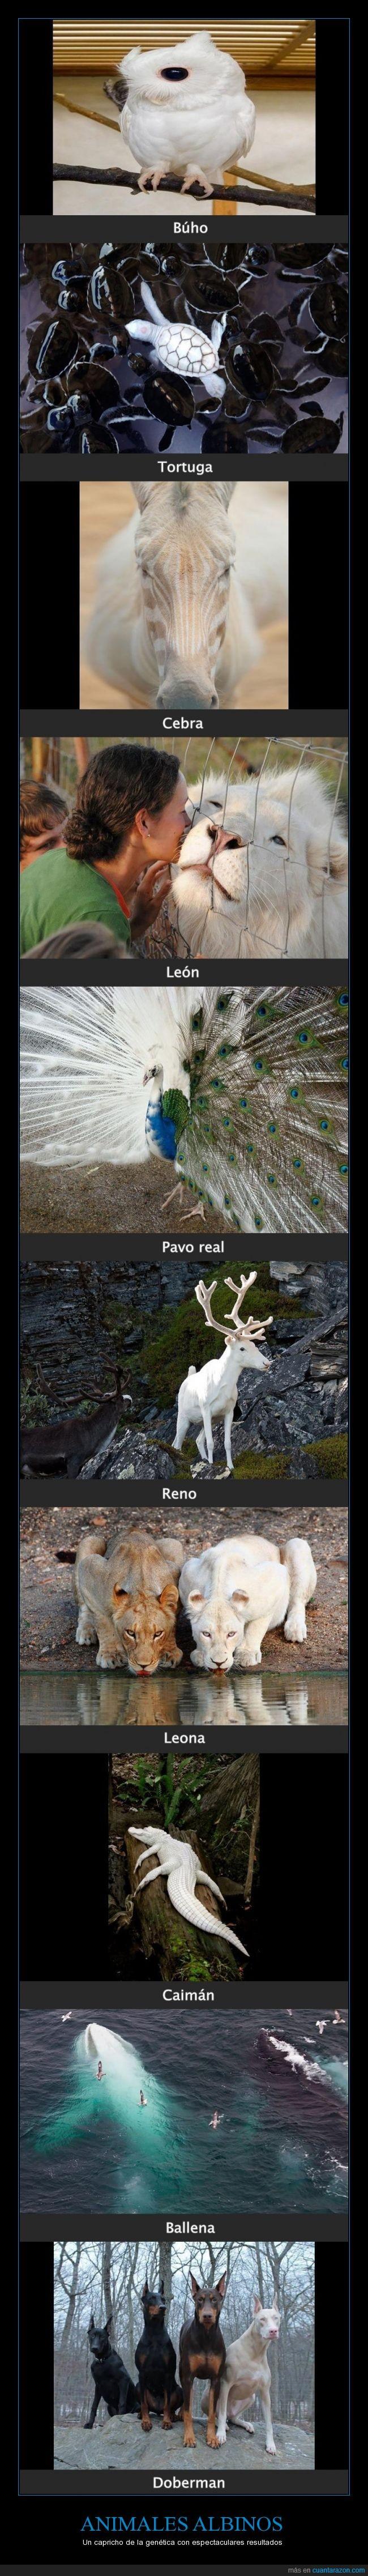 animales albinos,Ballena,blancos,Búho,Caimán,Cebra,desordenes de pigmentación,Doberman,espectaculares,León,Leona,naturaleza,Pavo real,reino animal,Reno,Tortuga